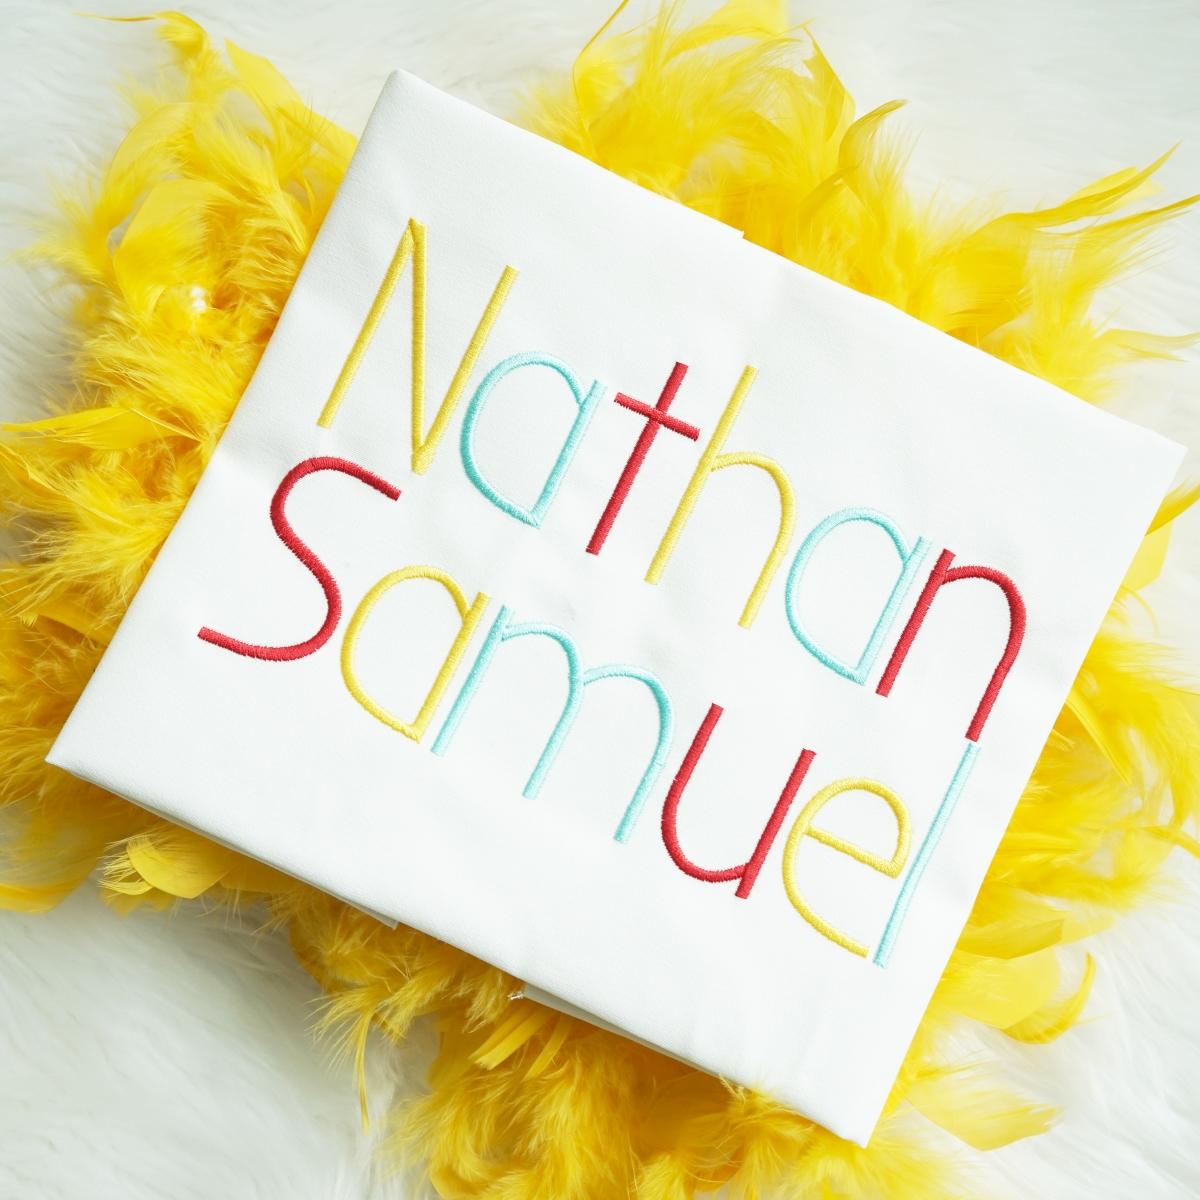 nathan.jpg